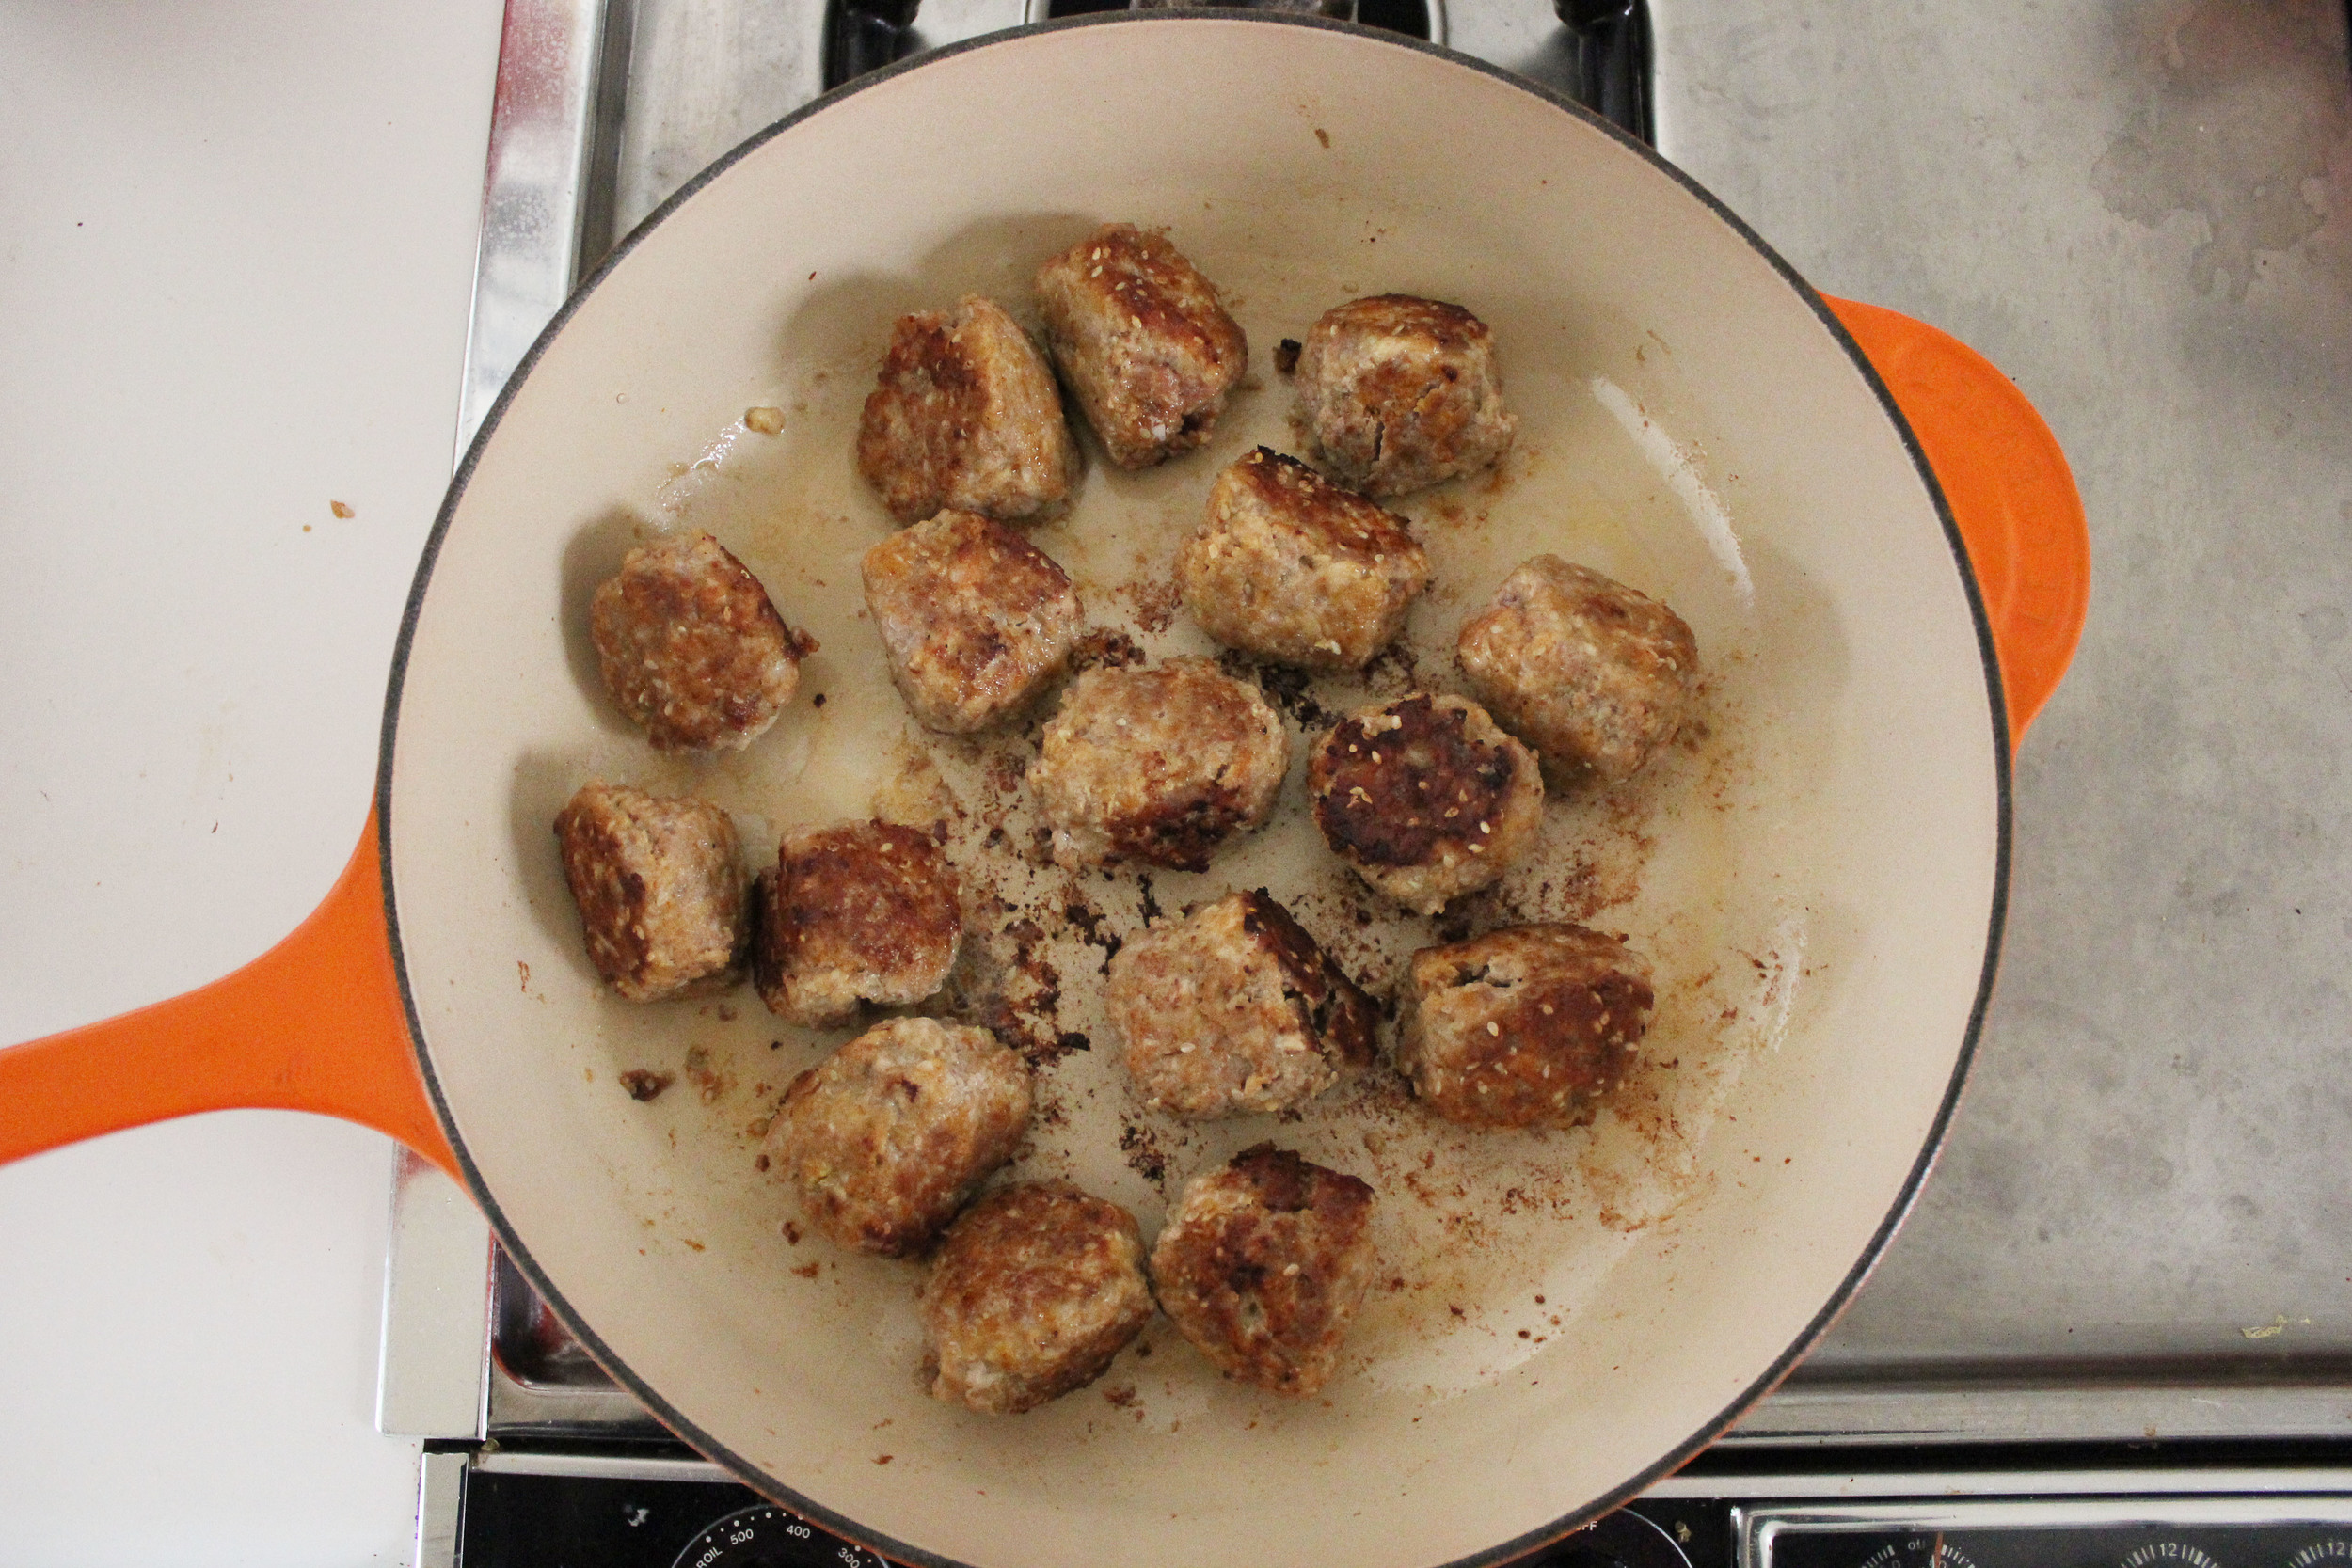 Smitten Kitchen's sesame-spiced turkey meatballs